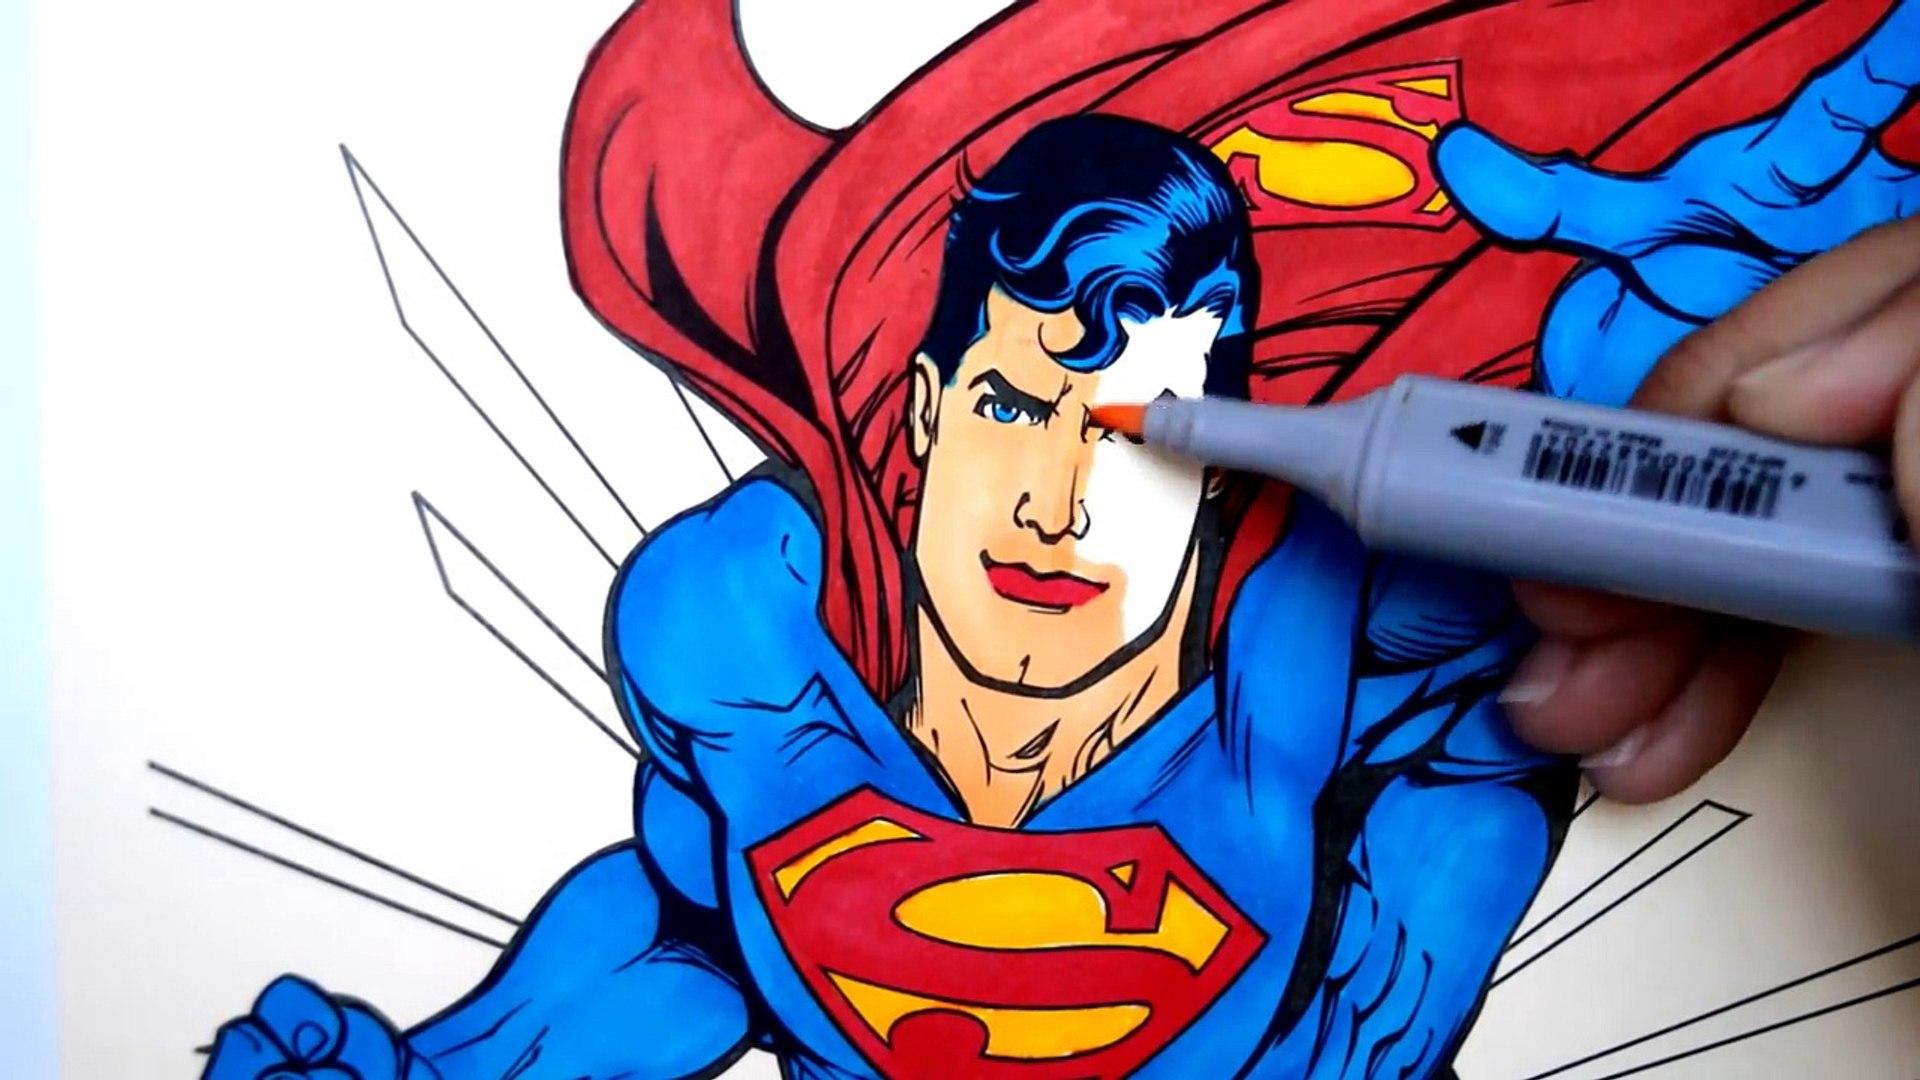 DISNEY SUPERHEROES Coloring Book Pages Superman Spiderman Kids Fun Art Activities Kids Balloons Toys